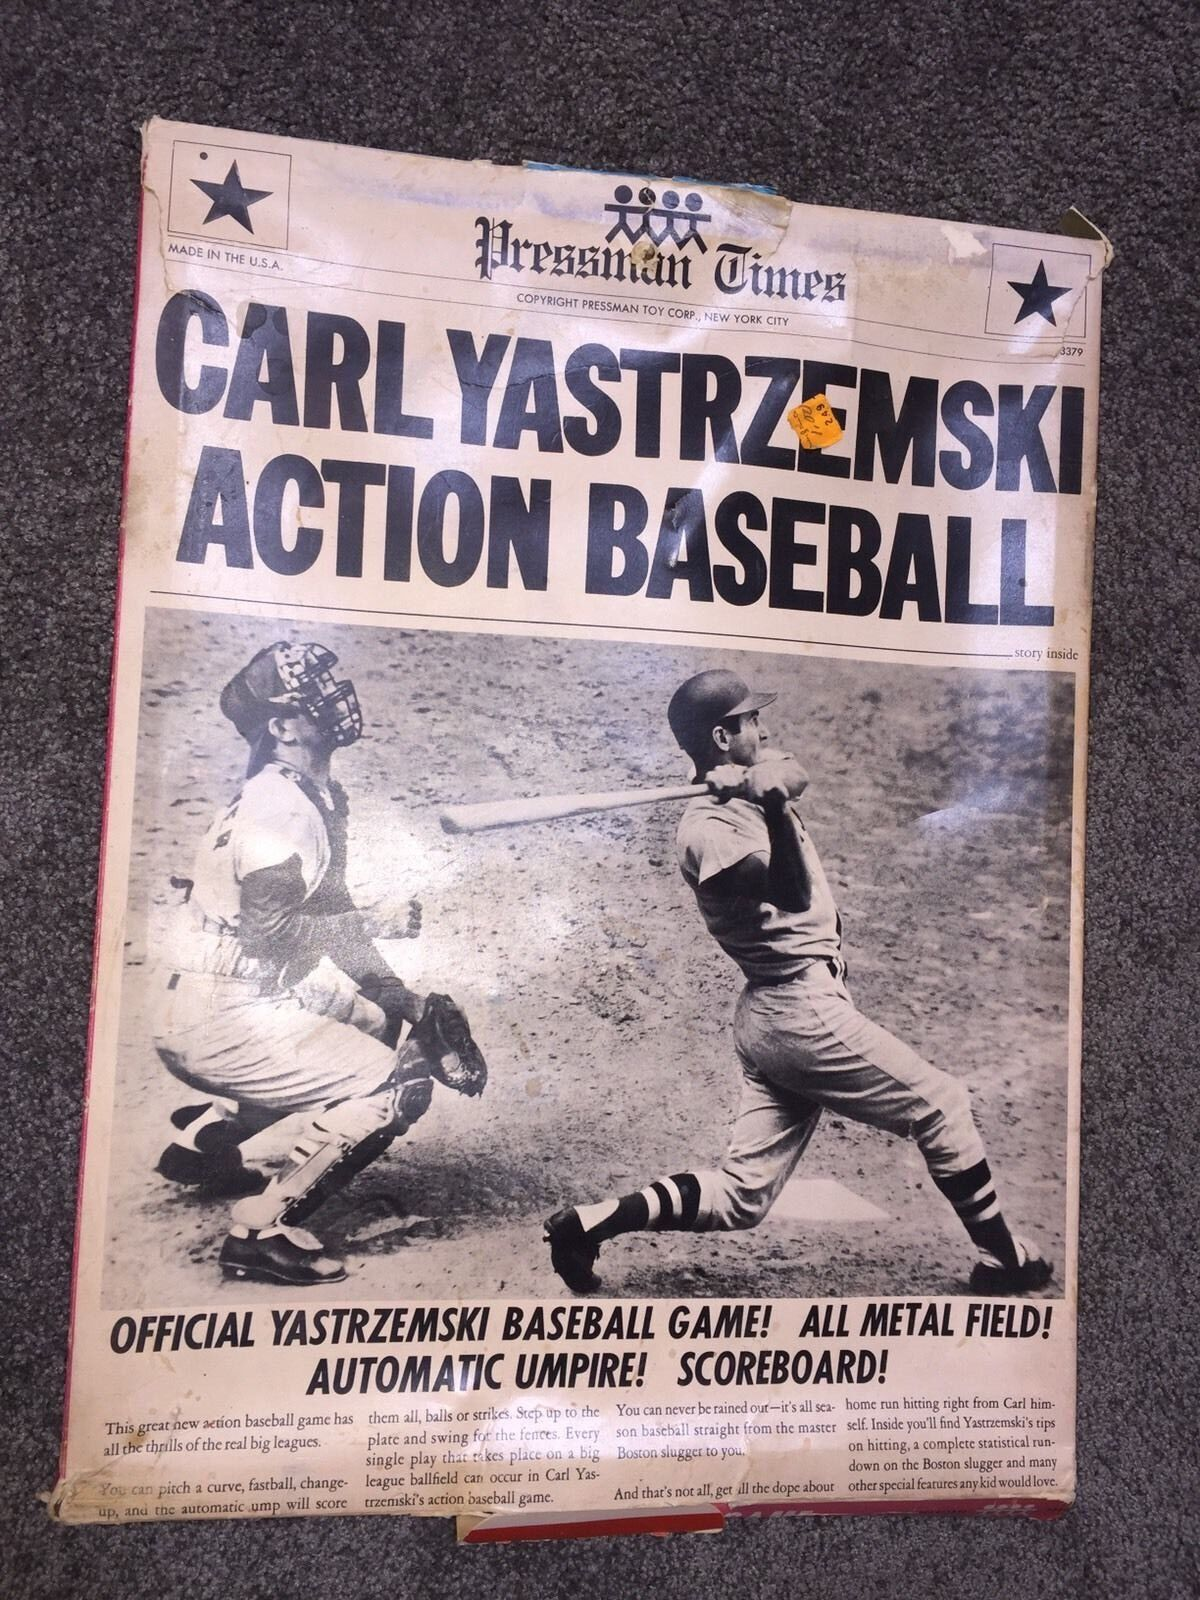 VINTAGE PRESSMAN BOSTON rot SOX CARL YASTRZEMSKI ACTION BASEBALL GAME AUTOGRAPH